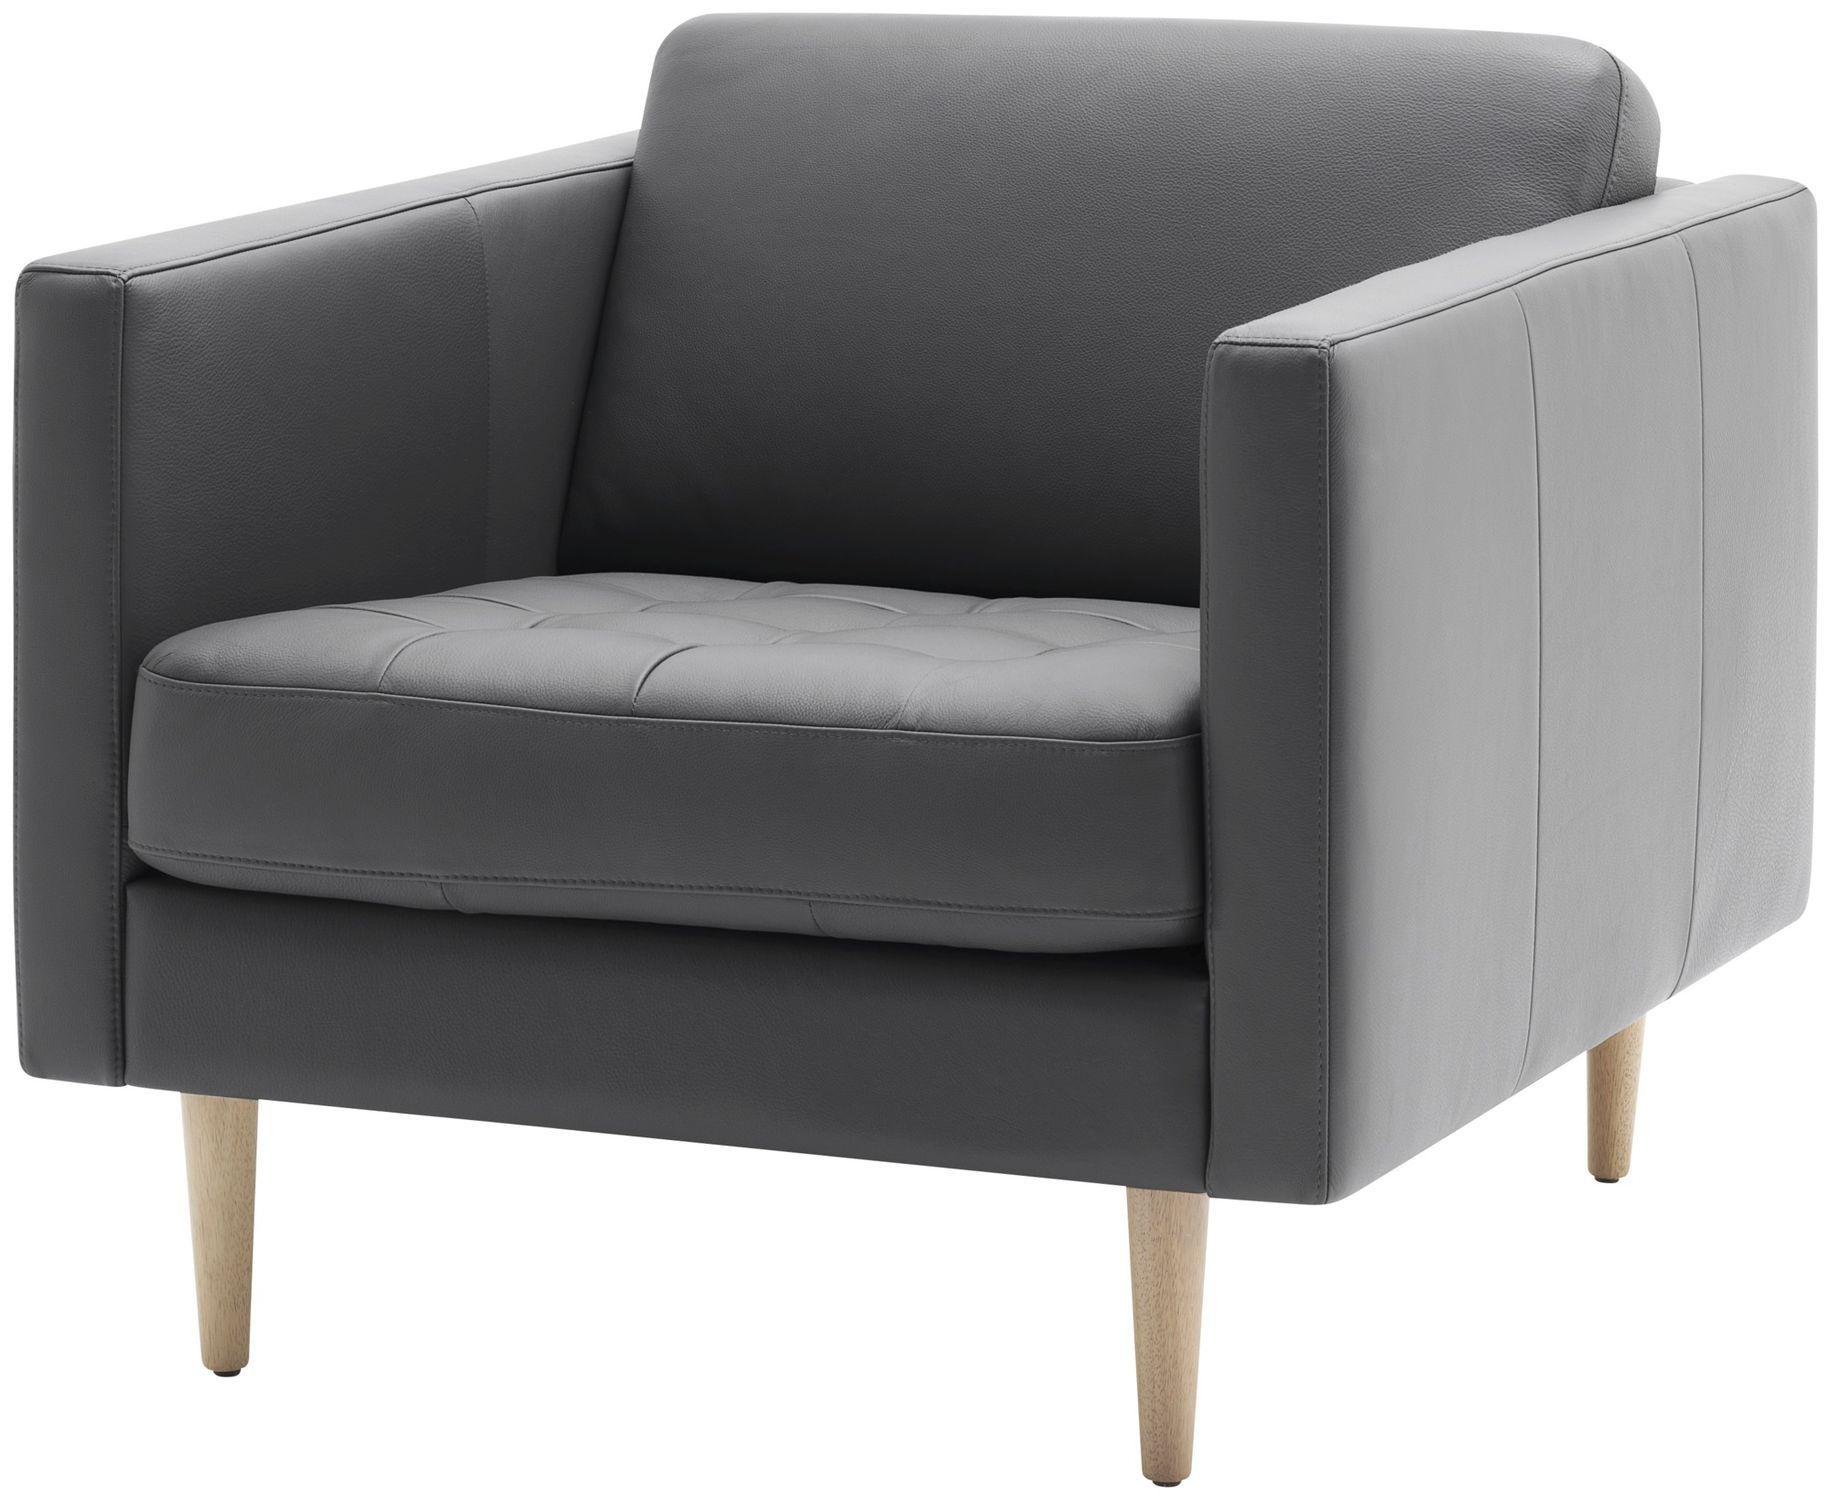 ... Contemporary Armchair / Fabric / Leather OSAKA BoConcept